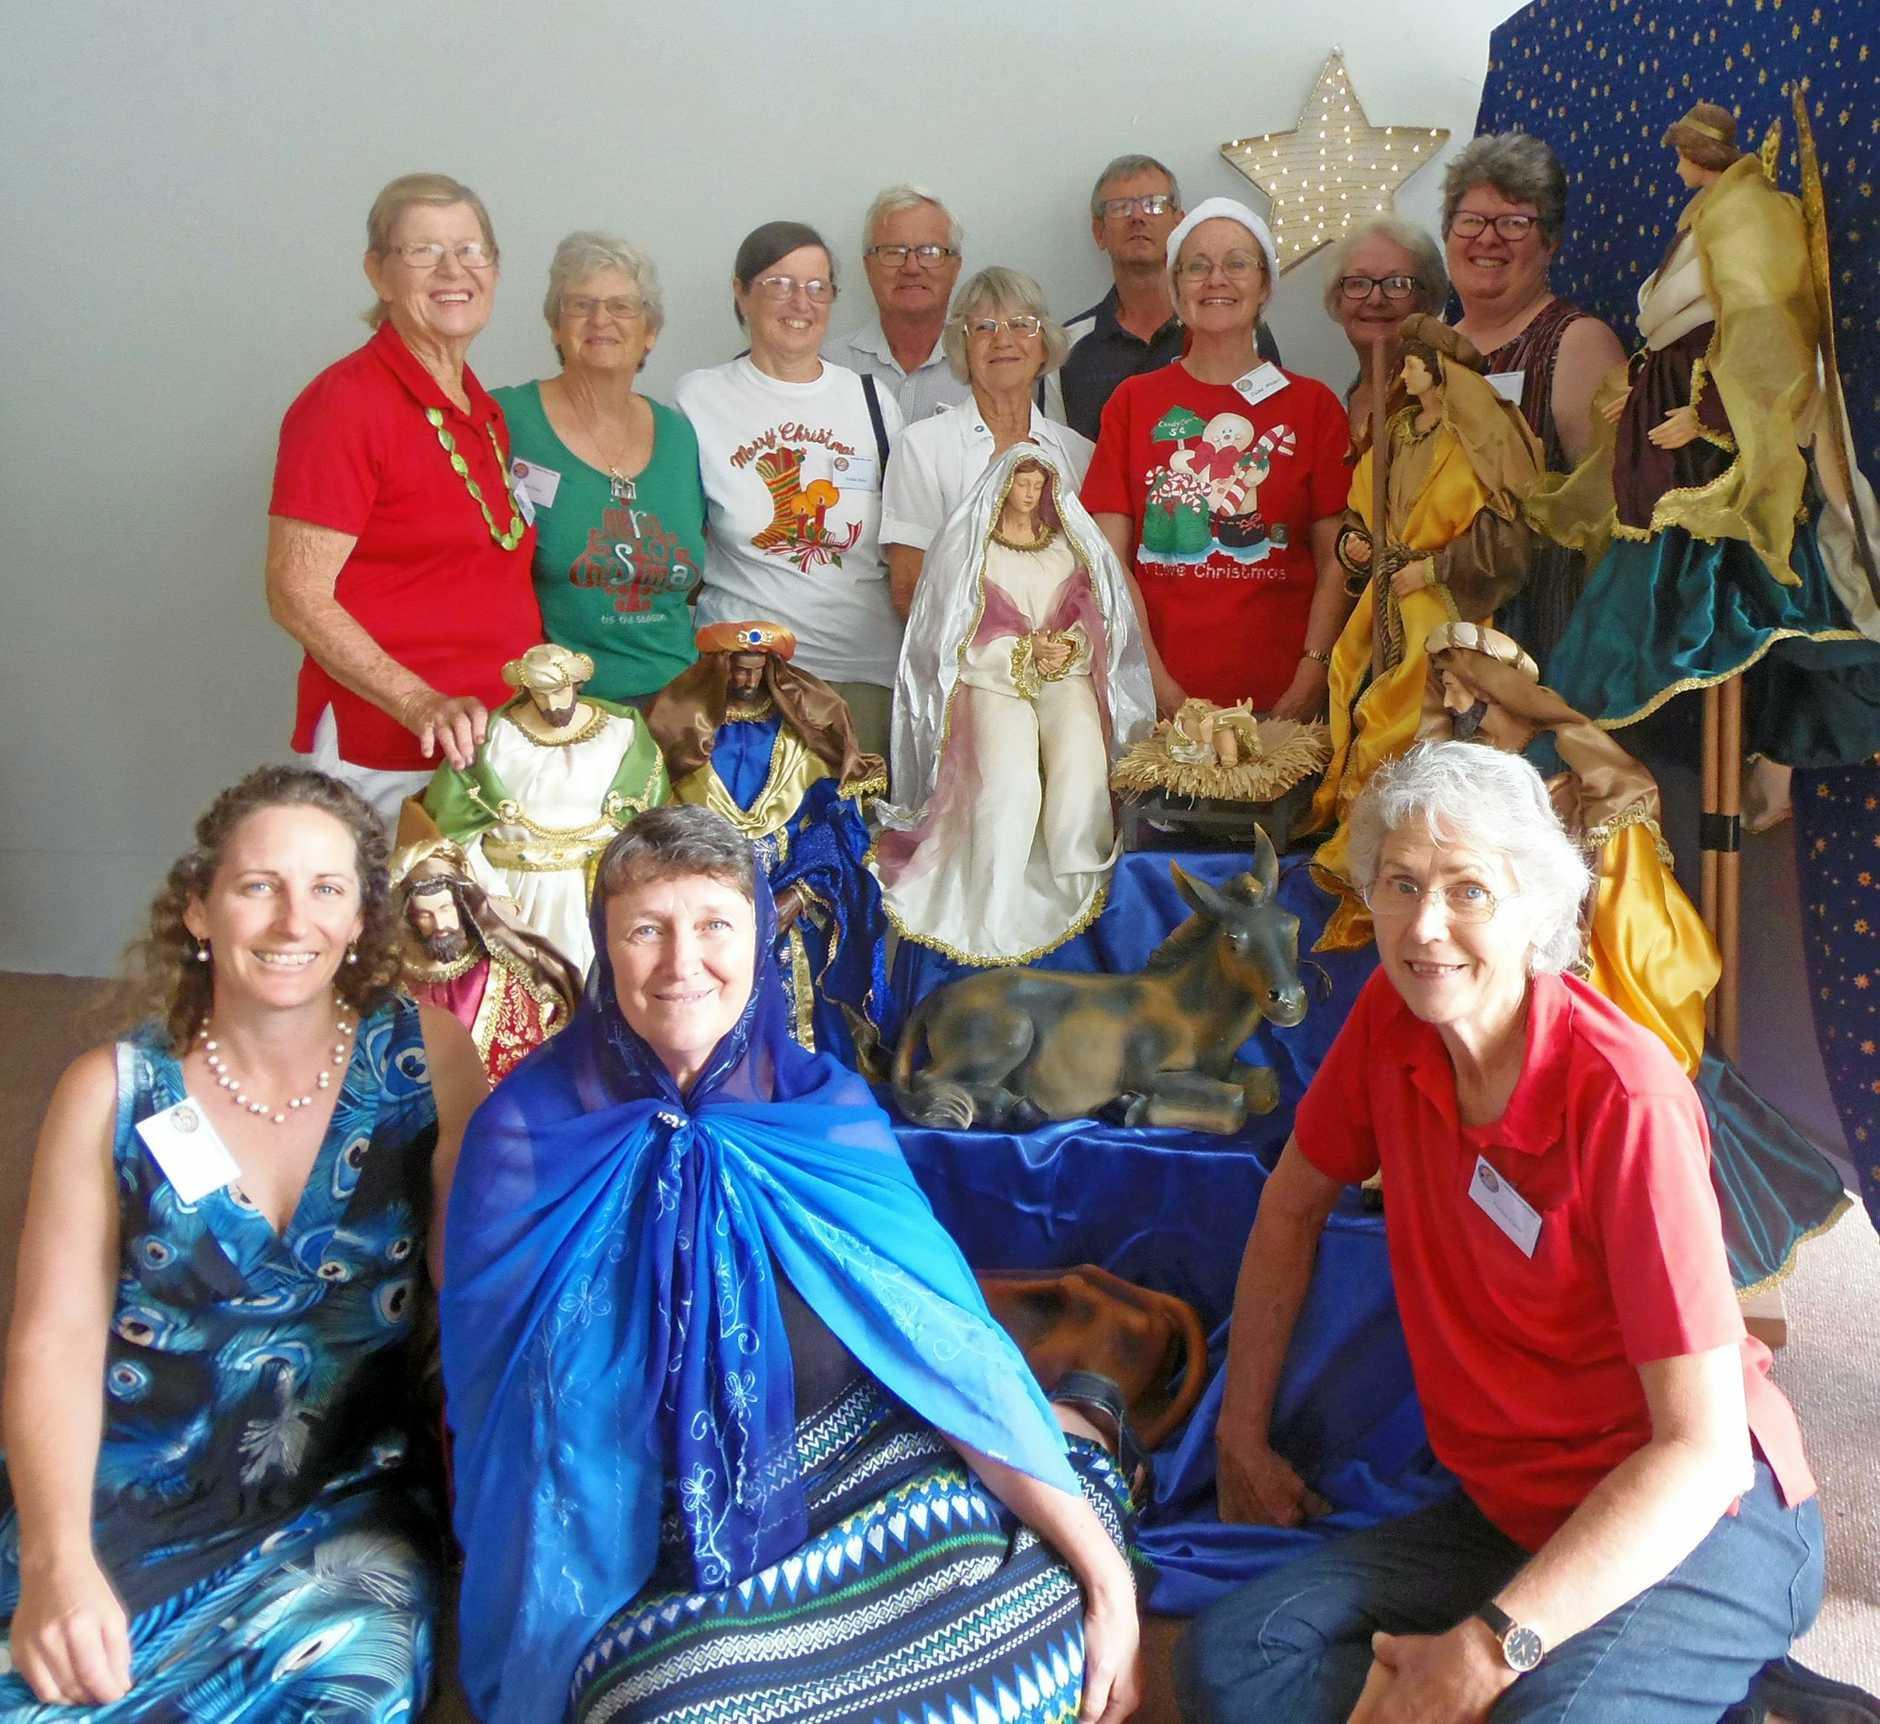 Volunteers from Warwick's Christian Churches gather around the Nativity Scene.